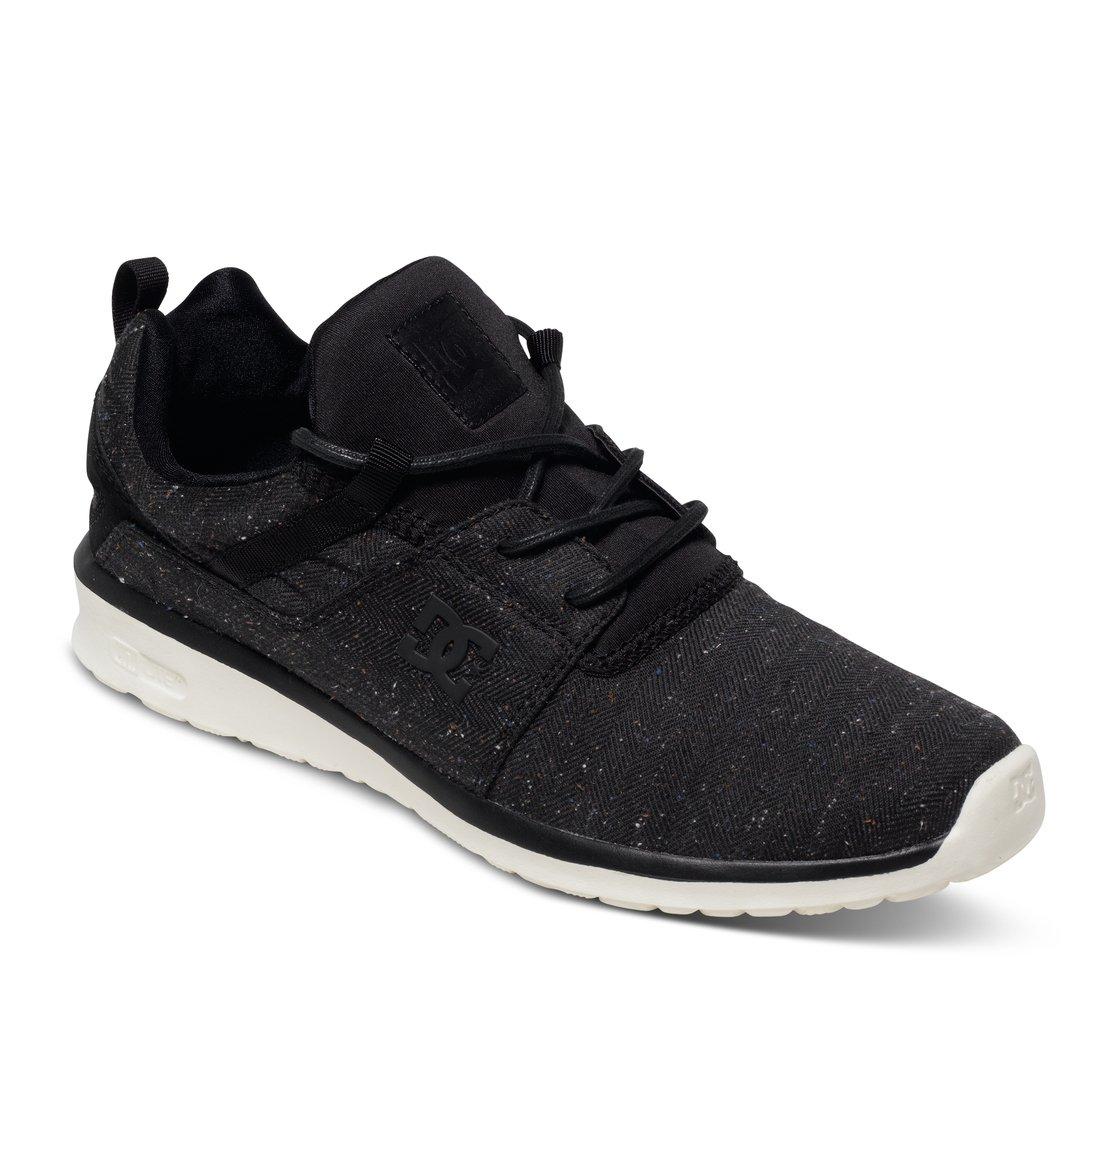 heathrow se shoes adys700073 dc shoes. Black Bedroom Furniture Sets. Home Design Ideas